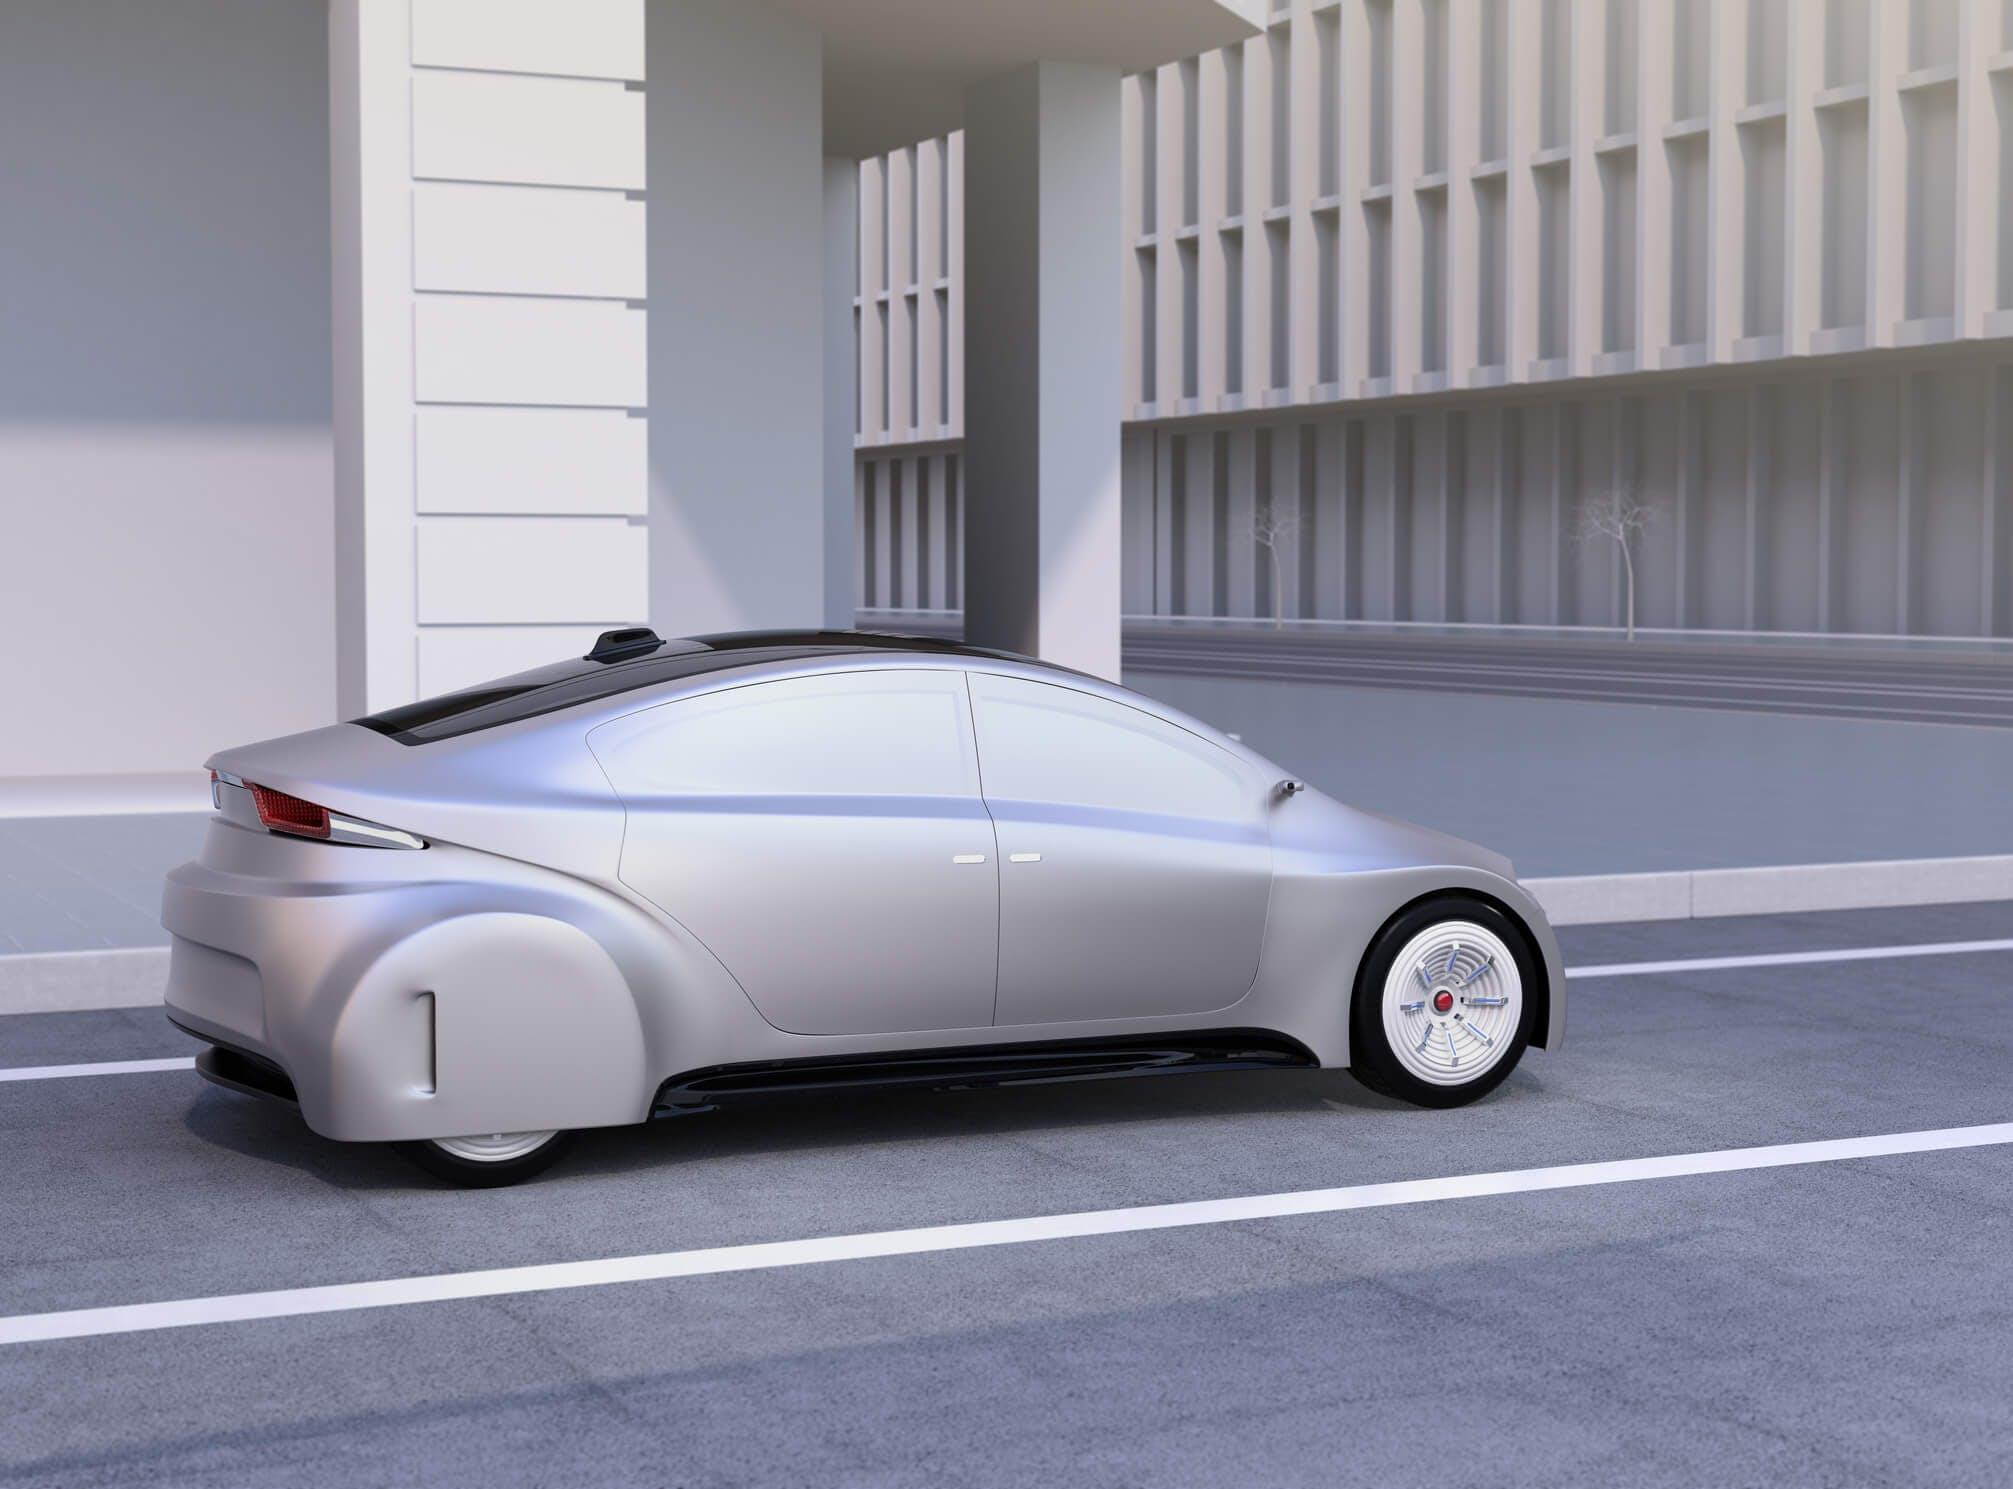 Titelbild-Auto-Zukunft-Concept-Car-selbstfahrend-iStock-670199174-Chesky-W